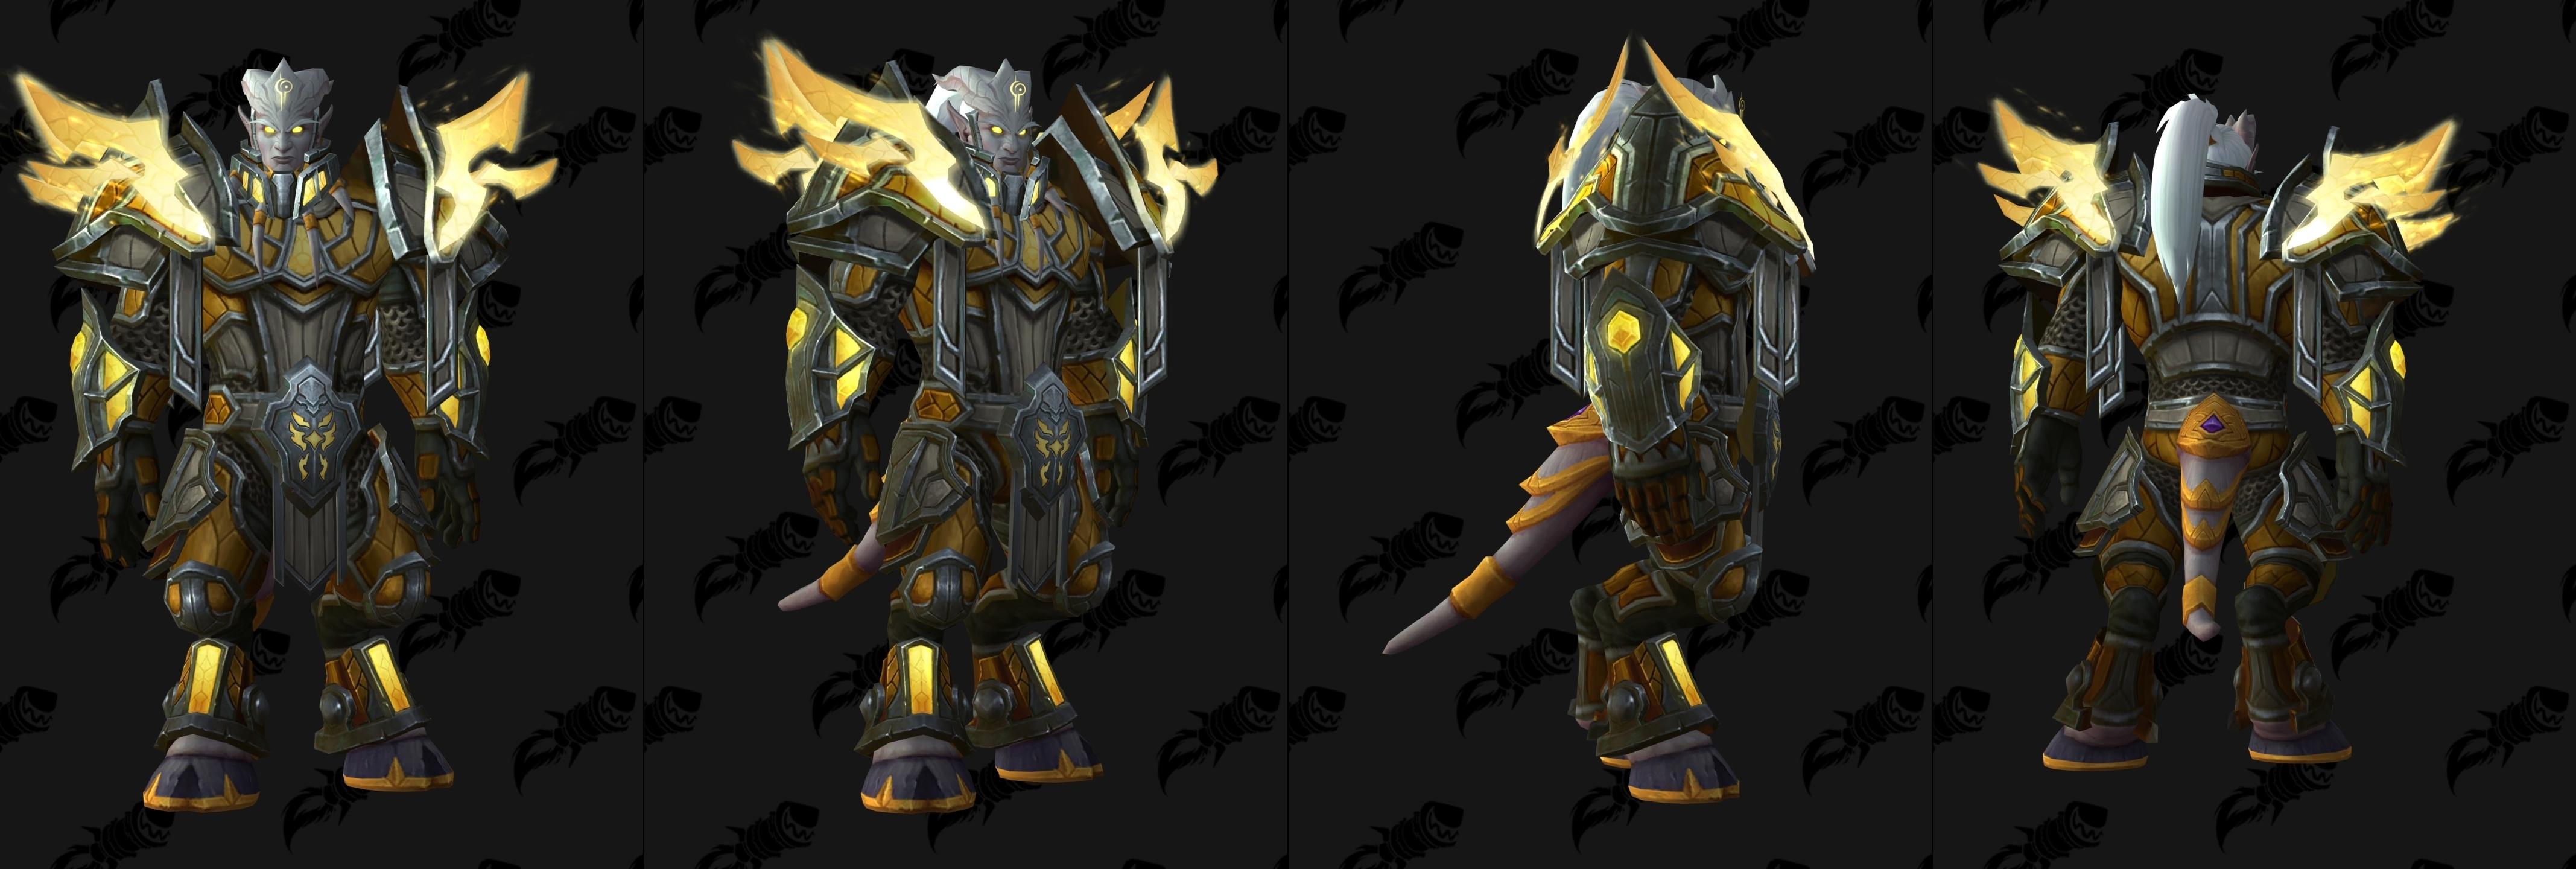 7 3 5 PTR - Heritage Armor Set Models - Wowhead News